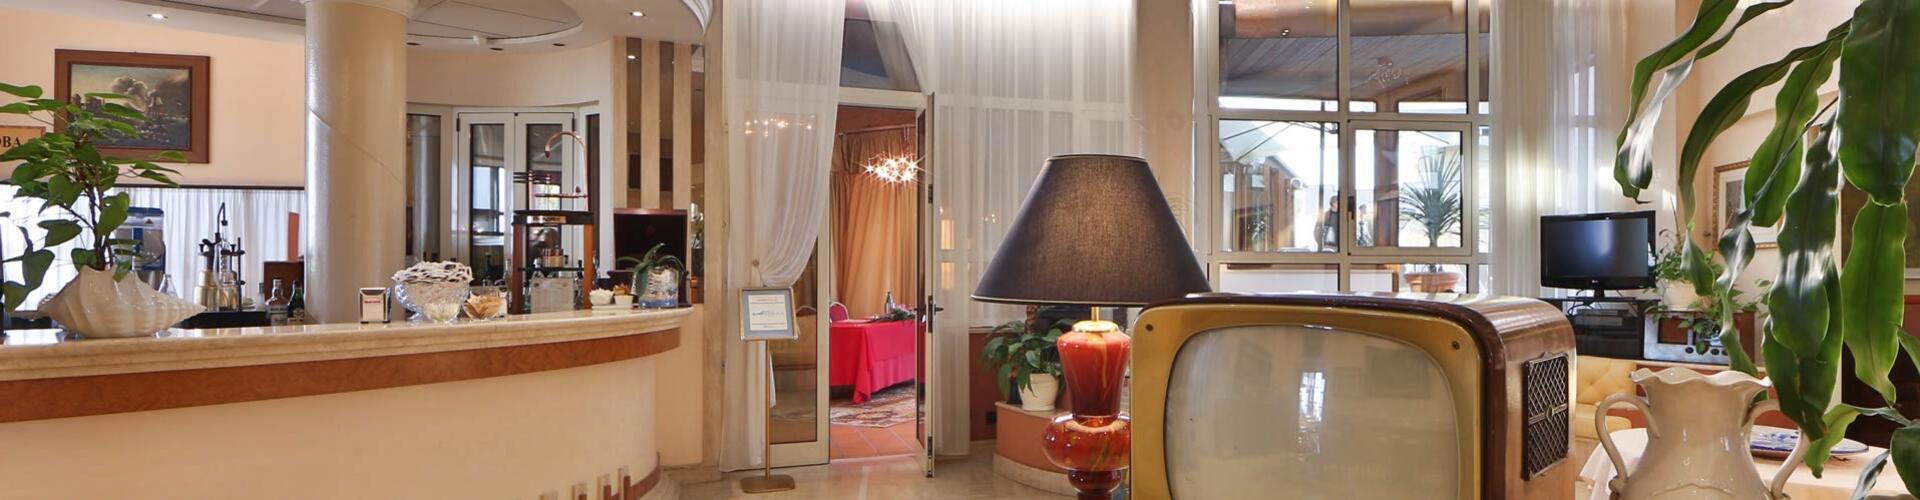 hoteldavidpalace en contacts 001